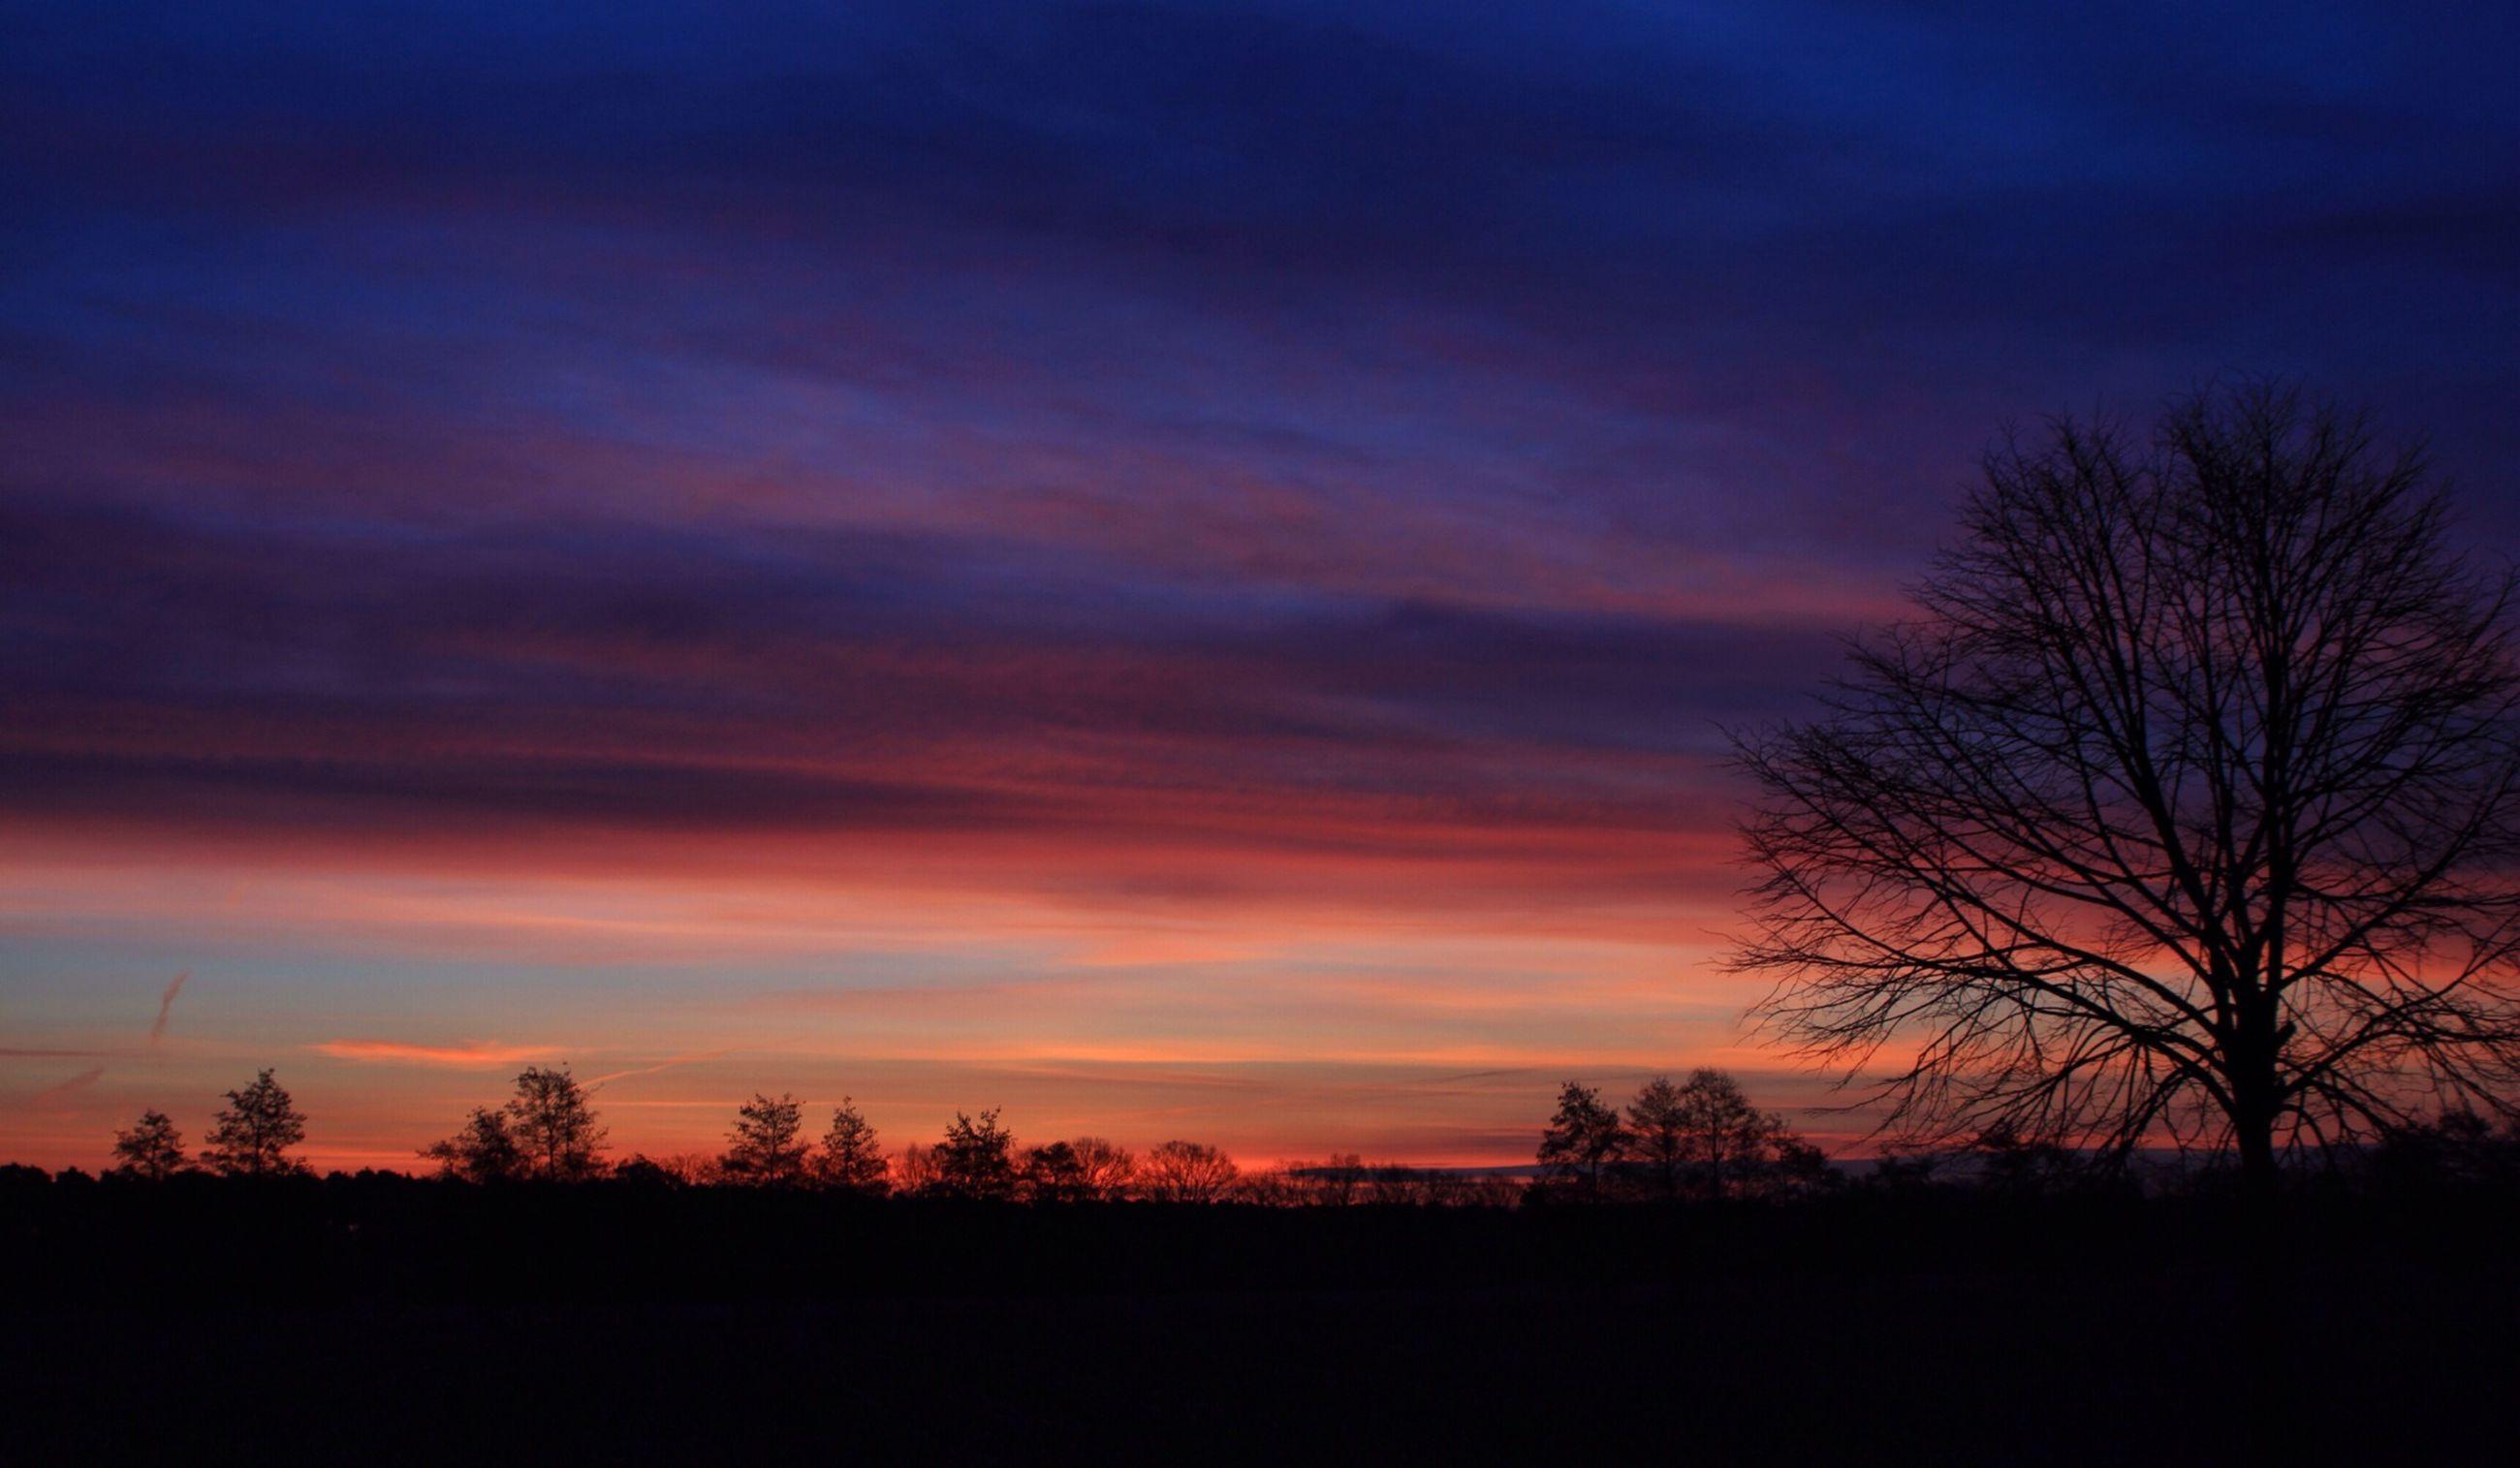 silhouette, sunset, sky, tranquil scene, tranquility, scenics, tree, beauty in nature, bare tree, landscape, cloud - sky, nature, orange color, dramatic sky, idyllic, cloud, field, dark, dusk, outdoors